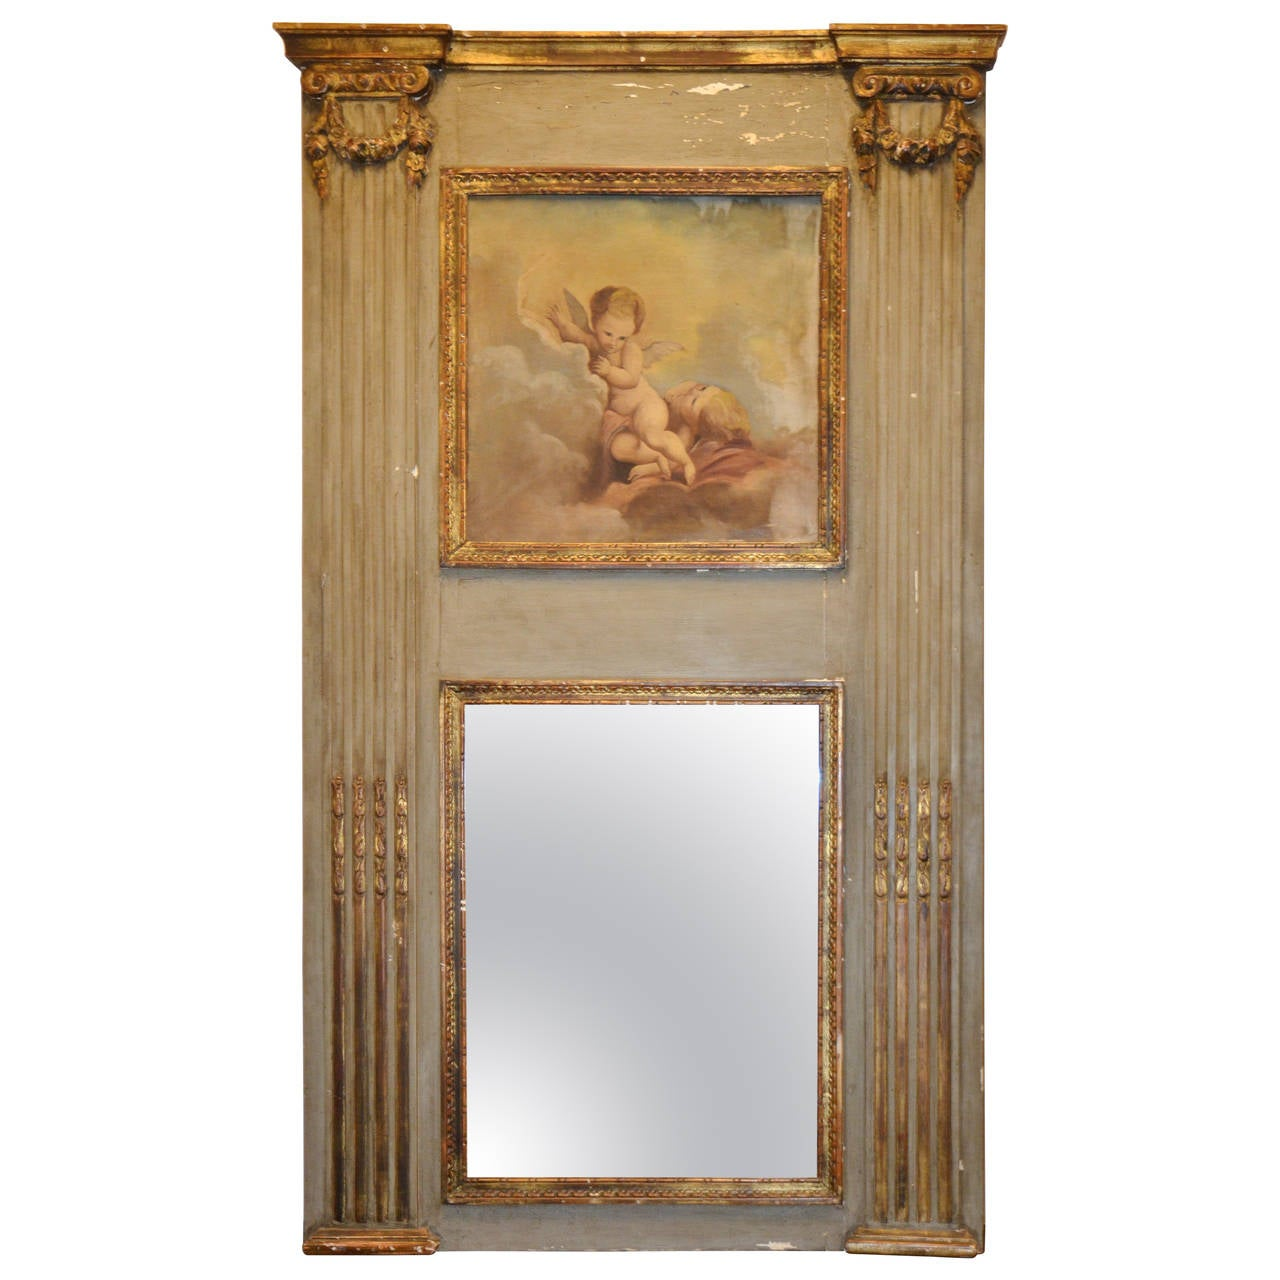 Louis XVI French Trumeau Parcel-Gilt Mirror